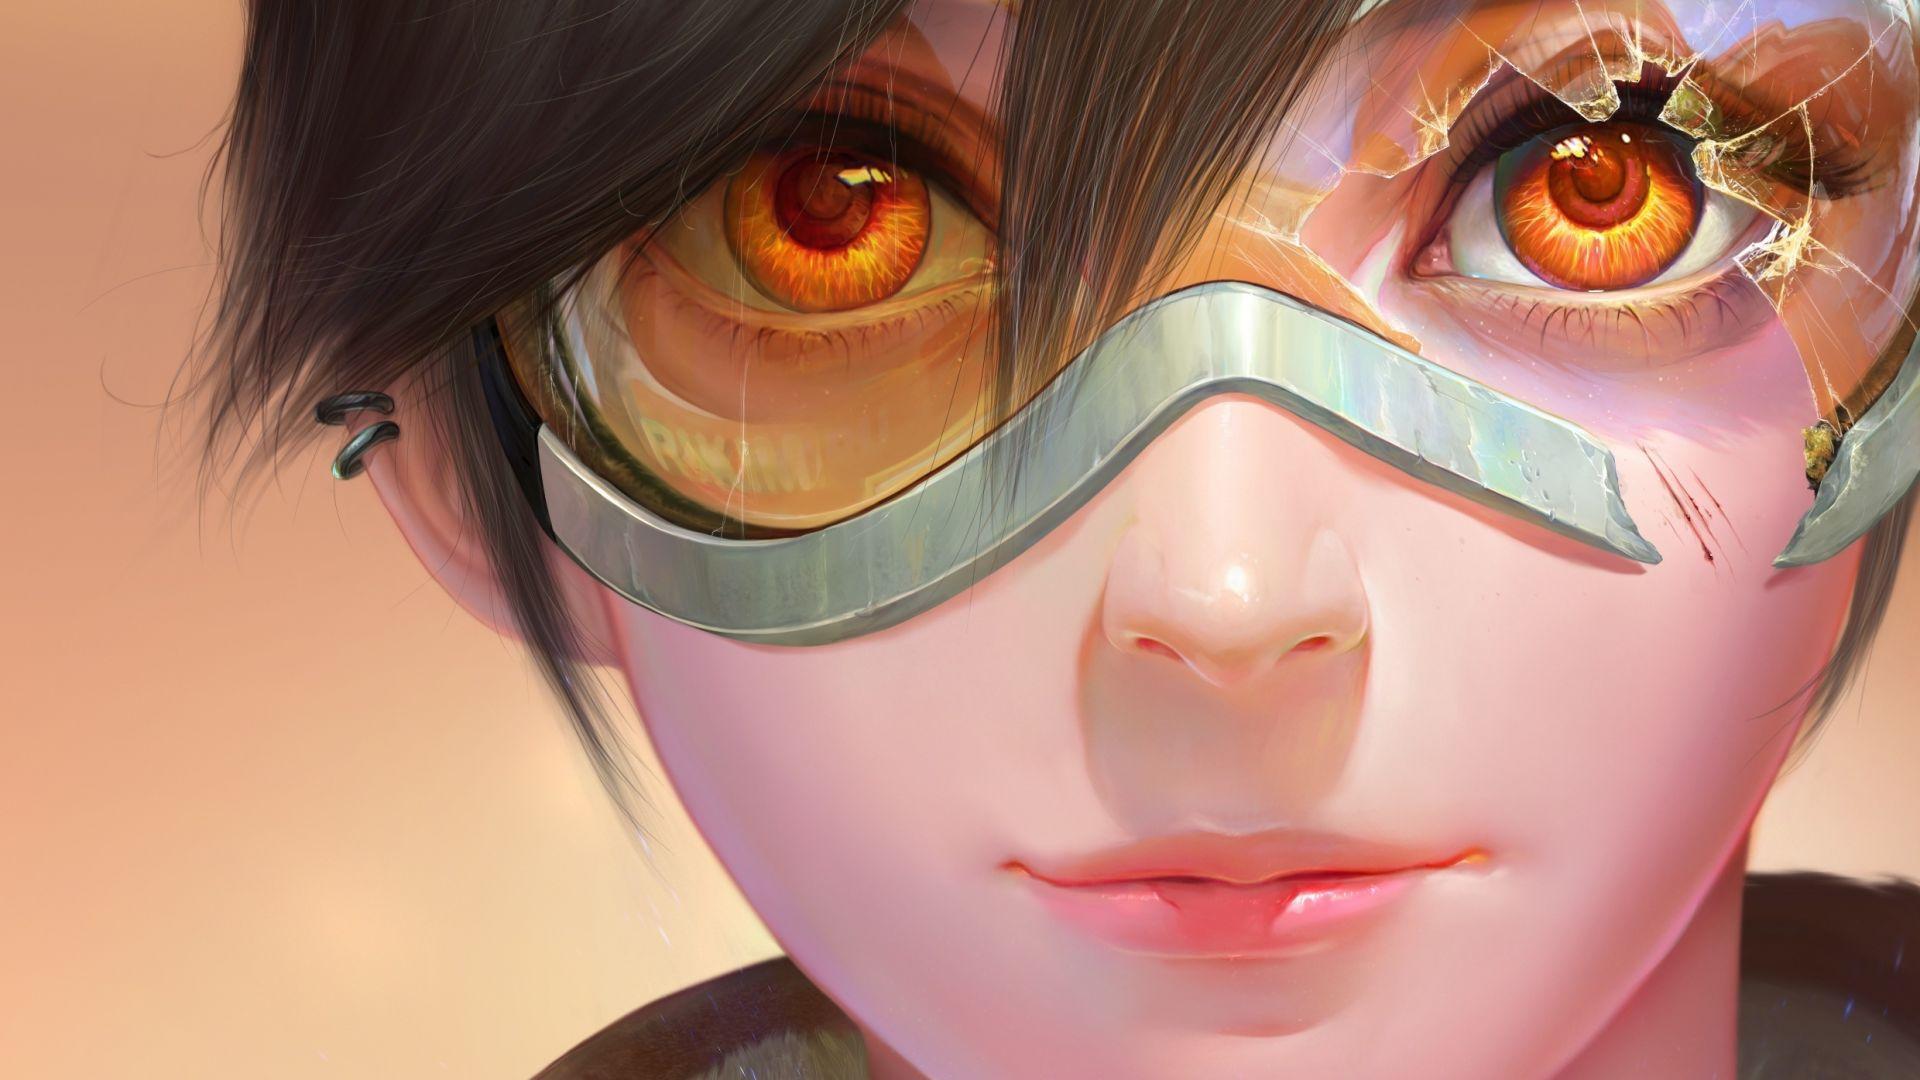 Wallpaper Tracer's face, broken sunglasses, overwatch, fan art